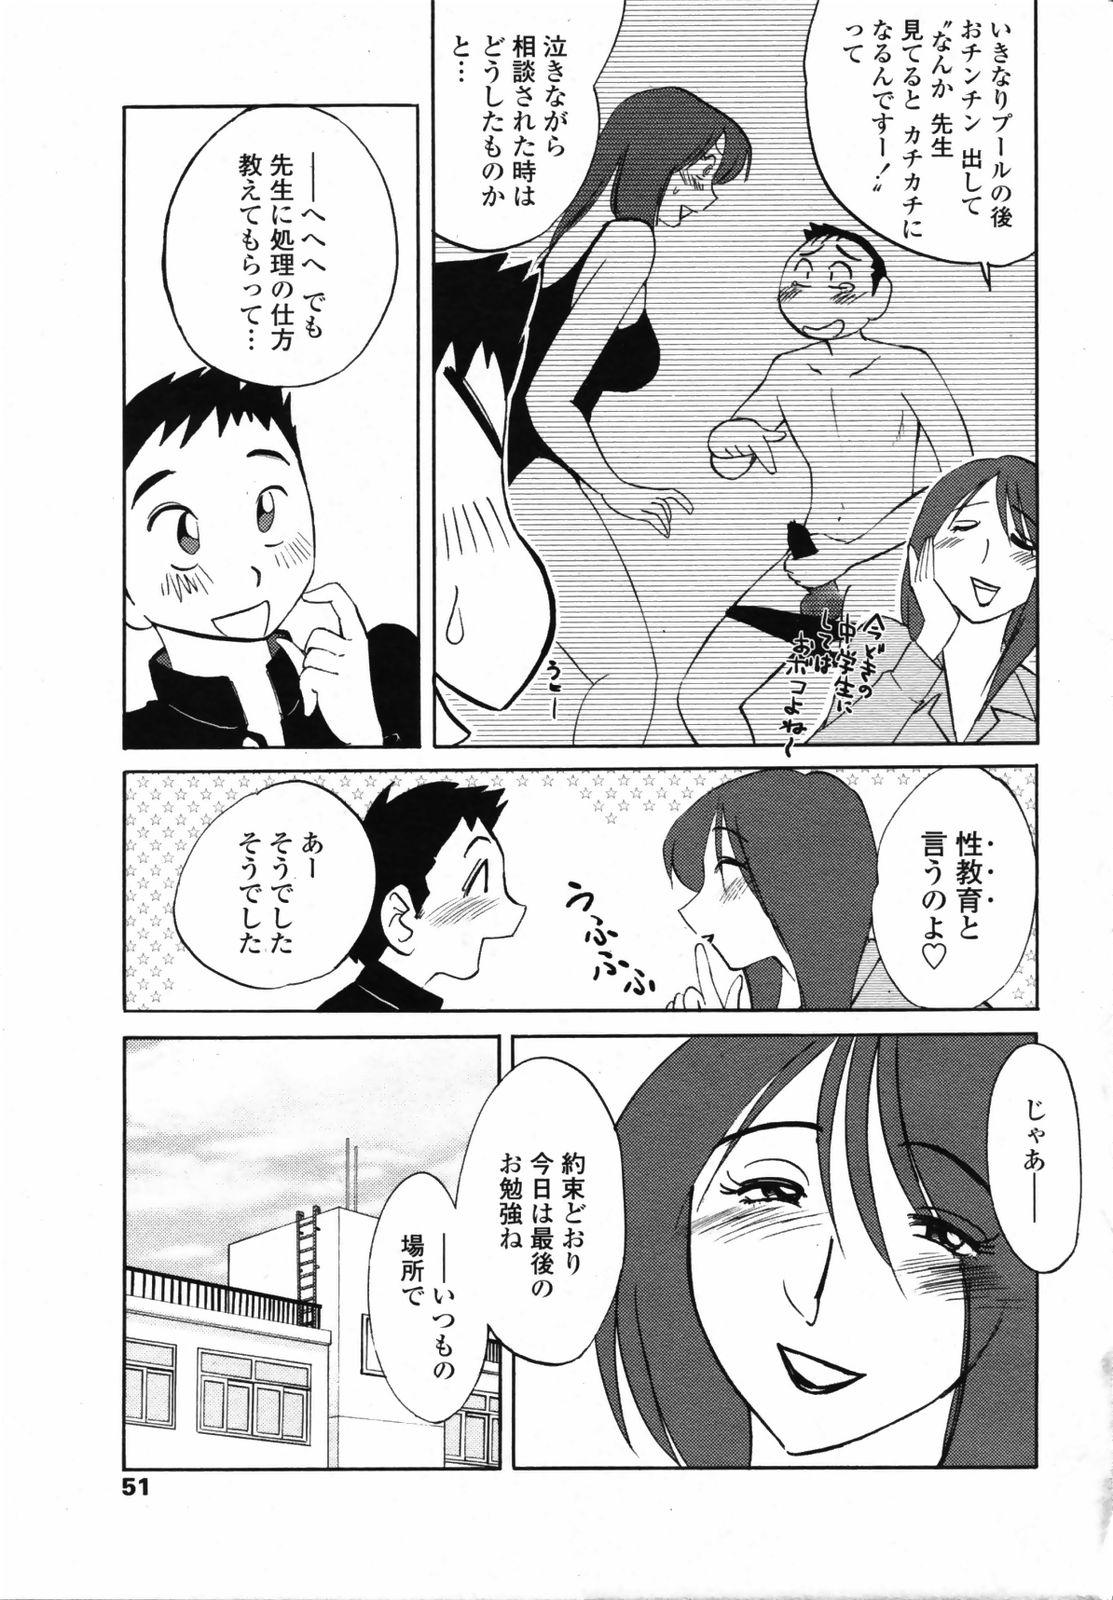 [Tsuyatsuya] Azumi-kun to Issho chapt.1-5 (Comic Penguin Club) 2